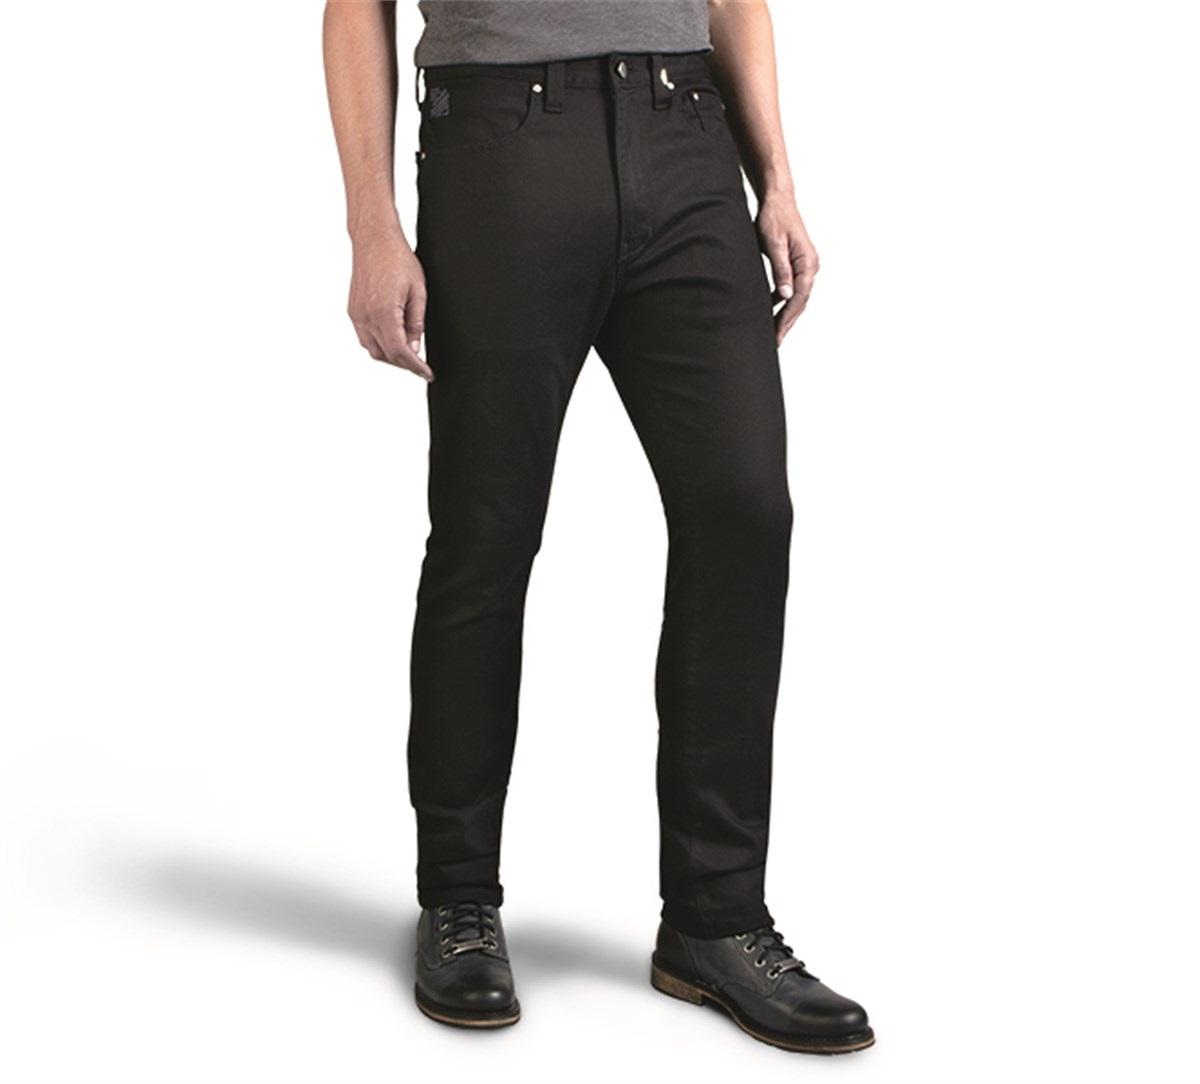 Harley-Davidson® Men's Black Label Core Slim Fit Jeans, Black